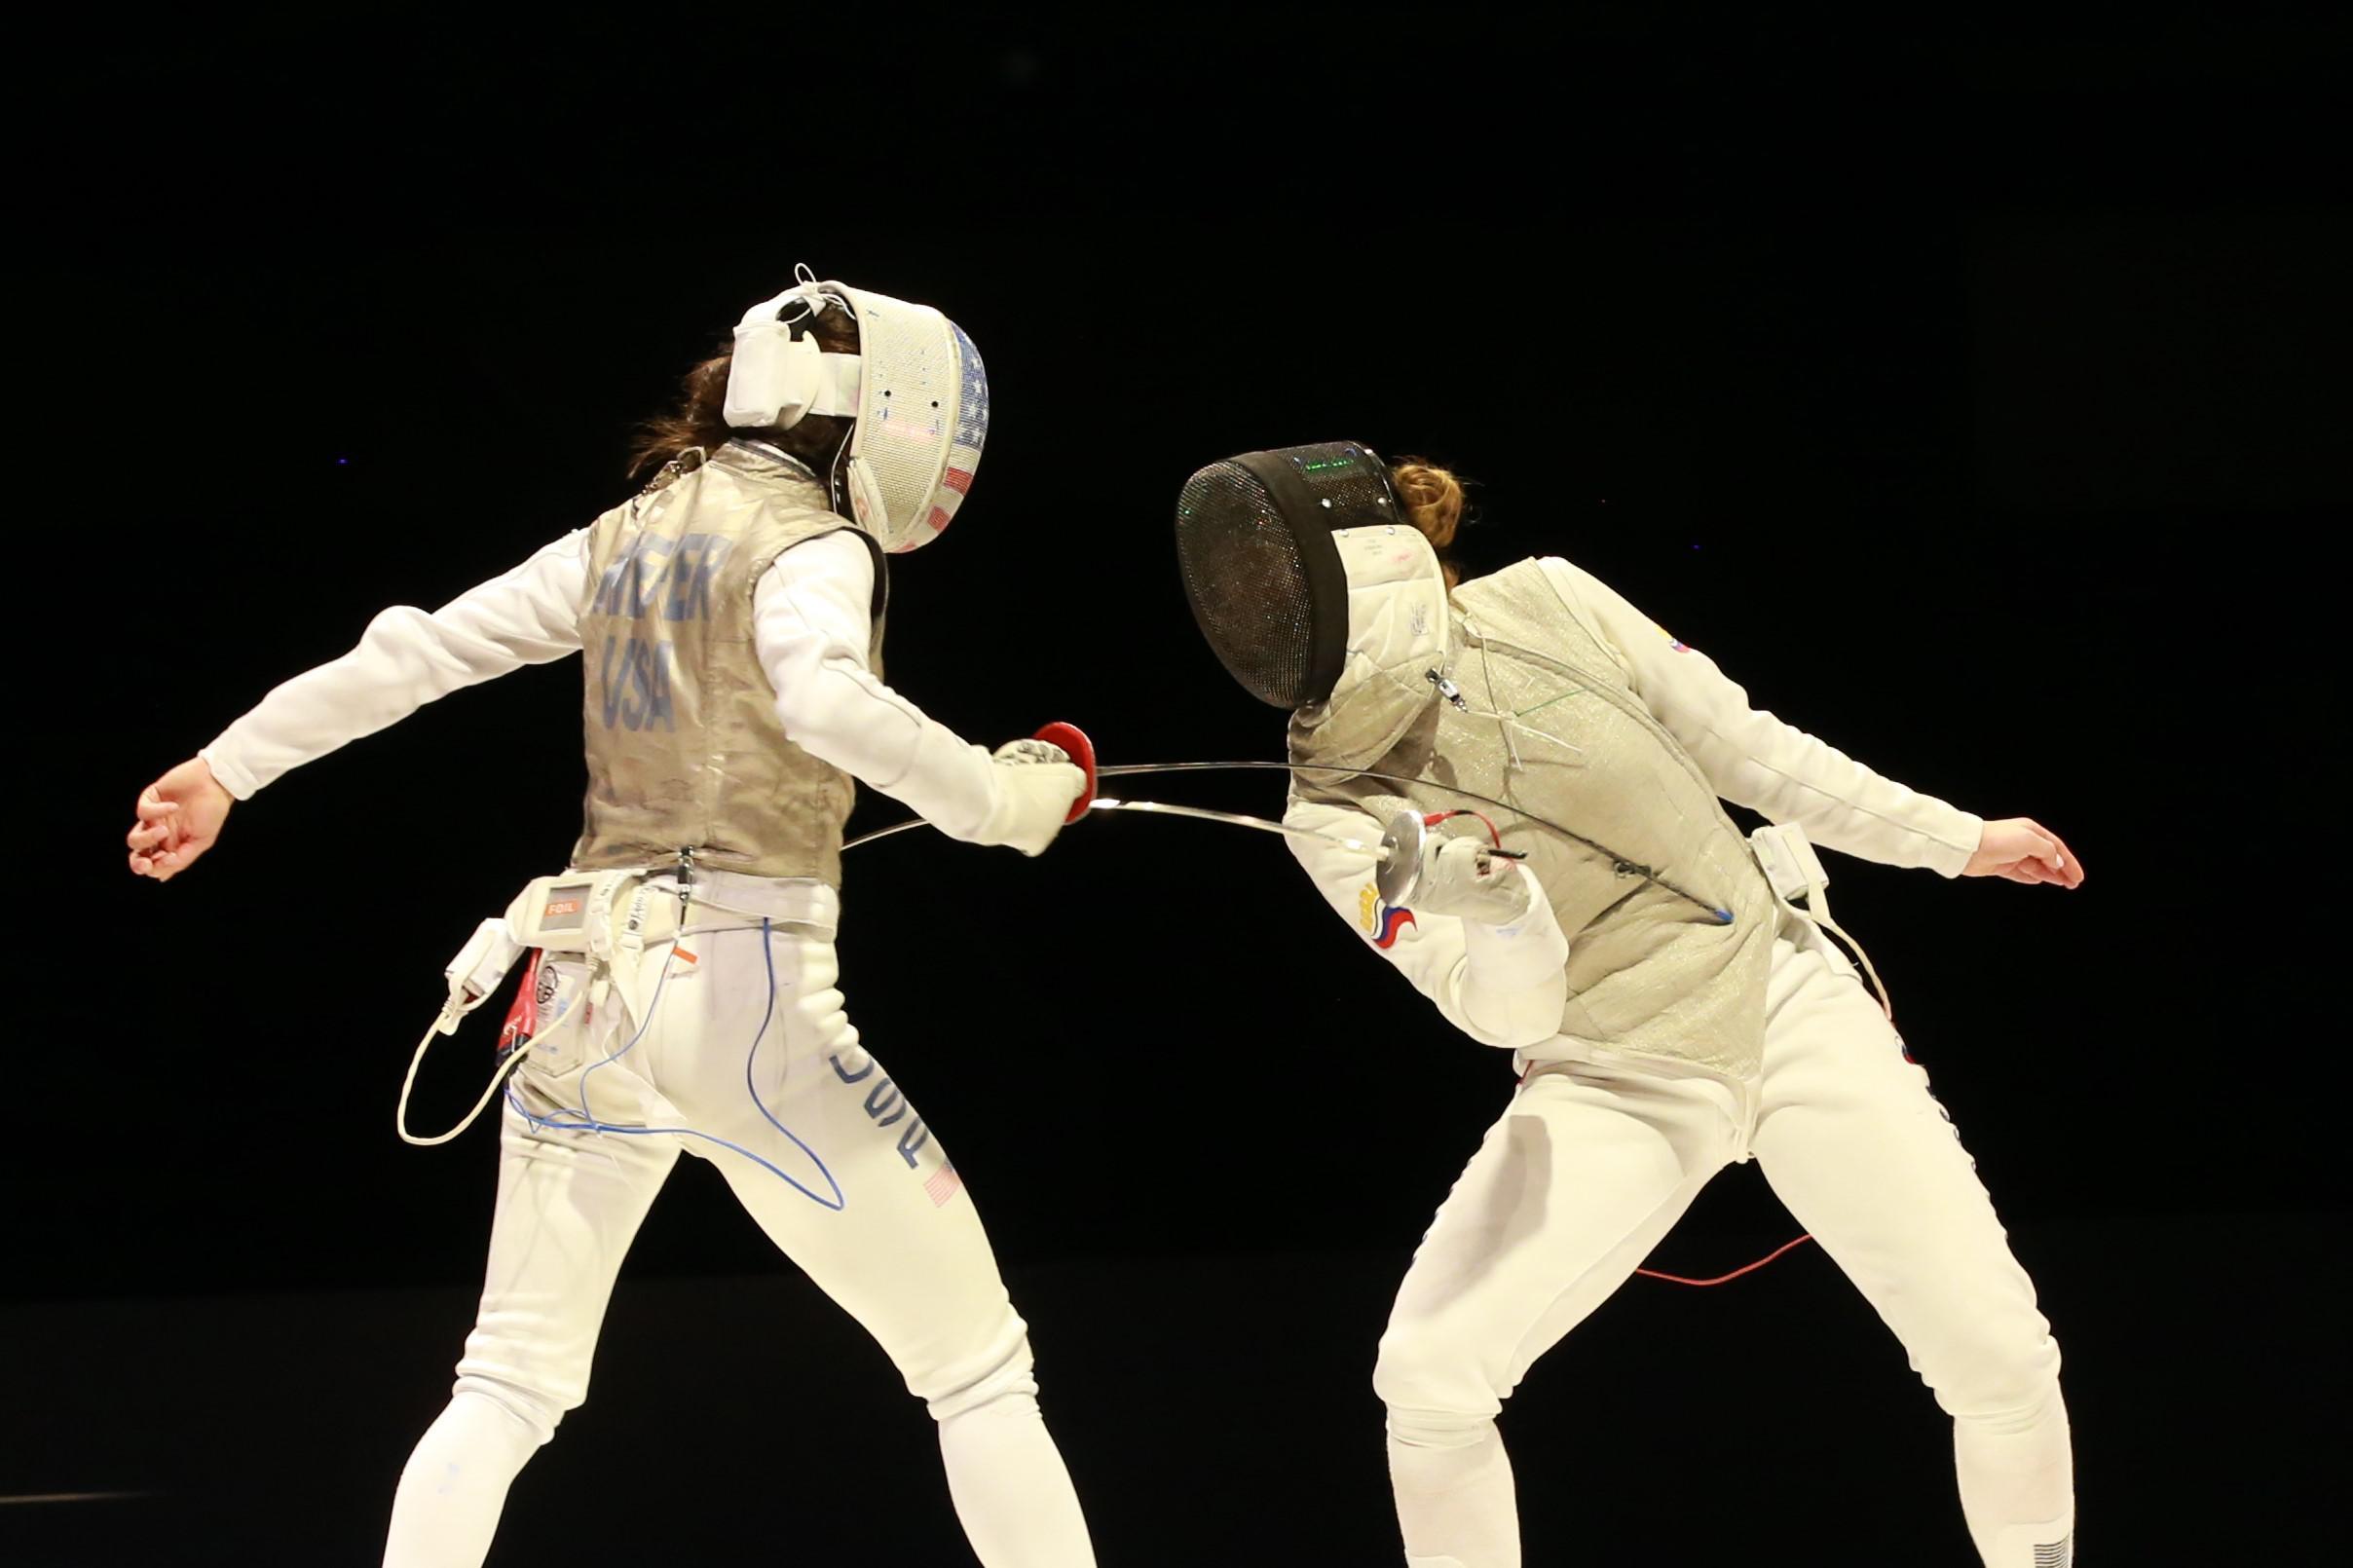 Watch The Absolute Fencing Gear 174 Fie Grand Prix Long Beach